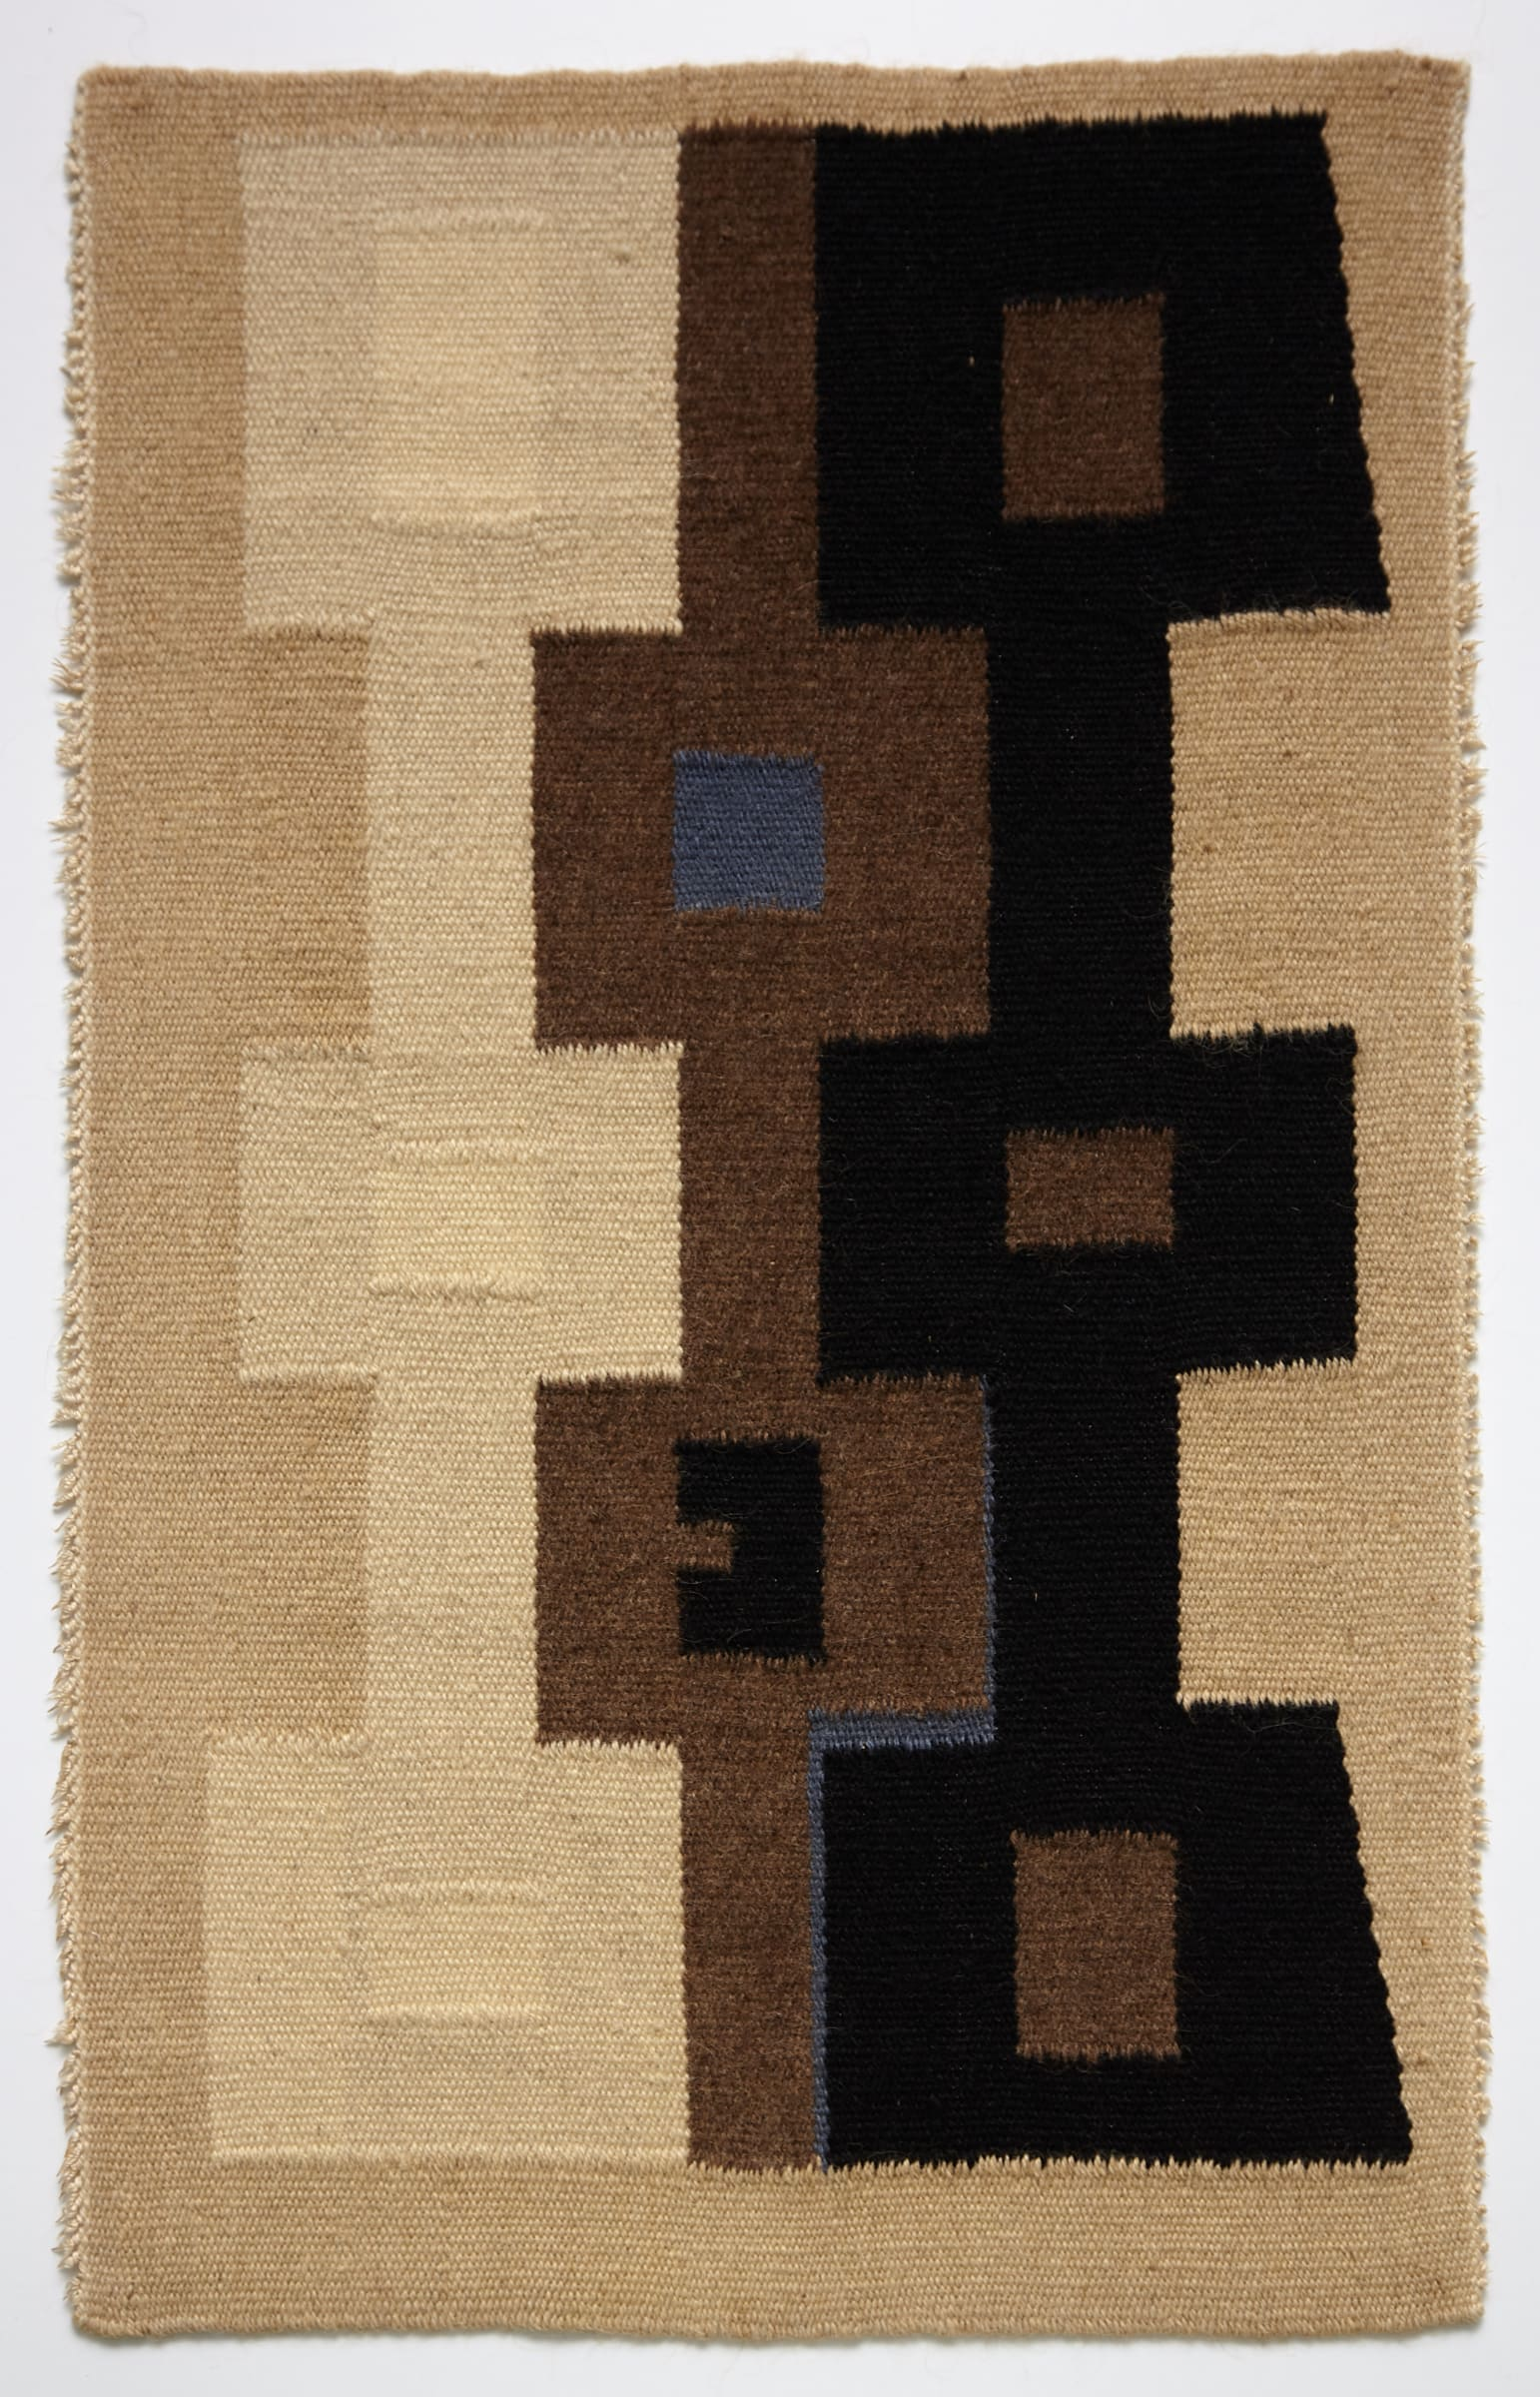 "<span class=""link fancybox-details-link""><a href=""/exhibitions/171/works/artworks15507/"">View Detail Page</a></span><div class=""artist""><strong>Ásgerður Búadóttir</strong></div><div class=""title""><em>Untitled</em>, ca 1960</div><div class=""medium"">wool</div><div class=""dimensions"">79 x 48 cm</div>"